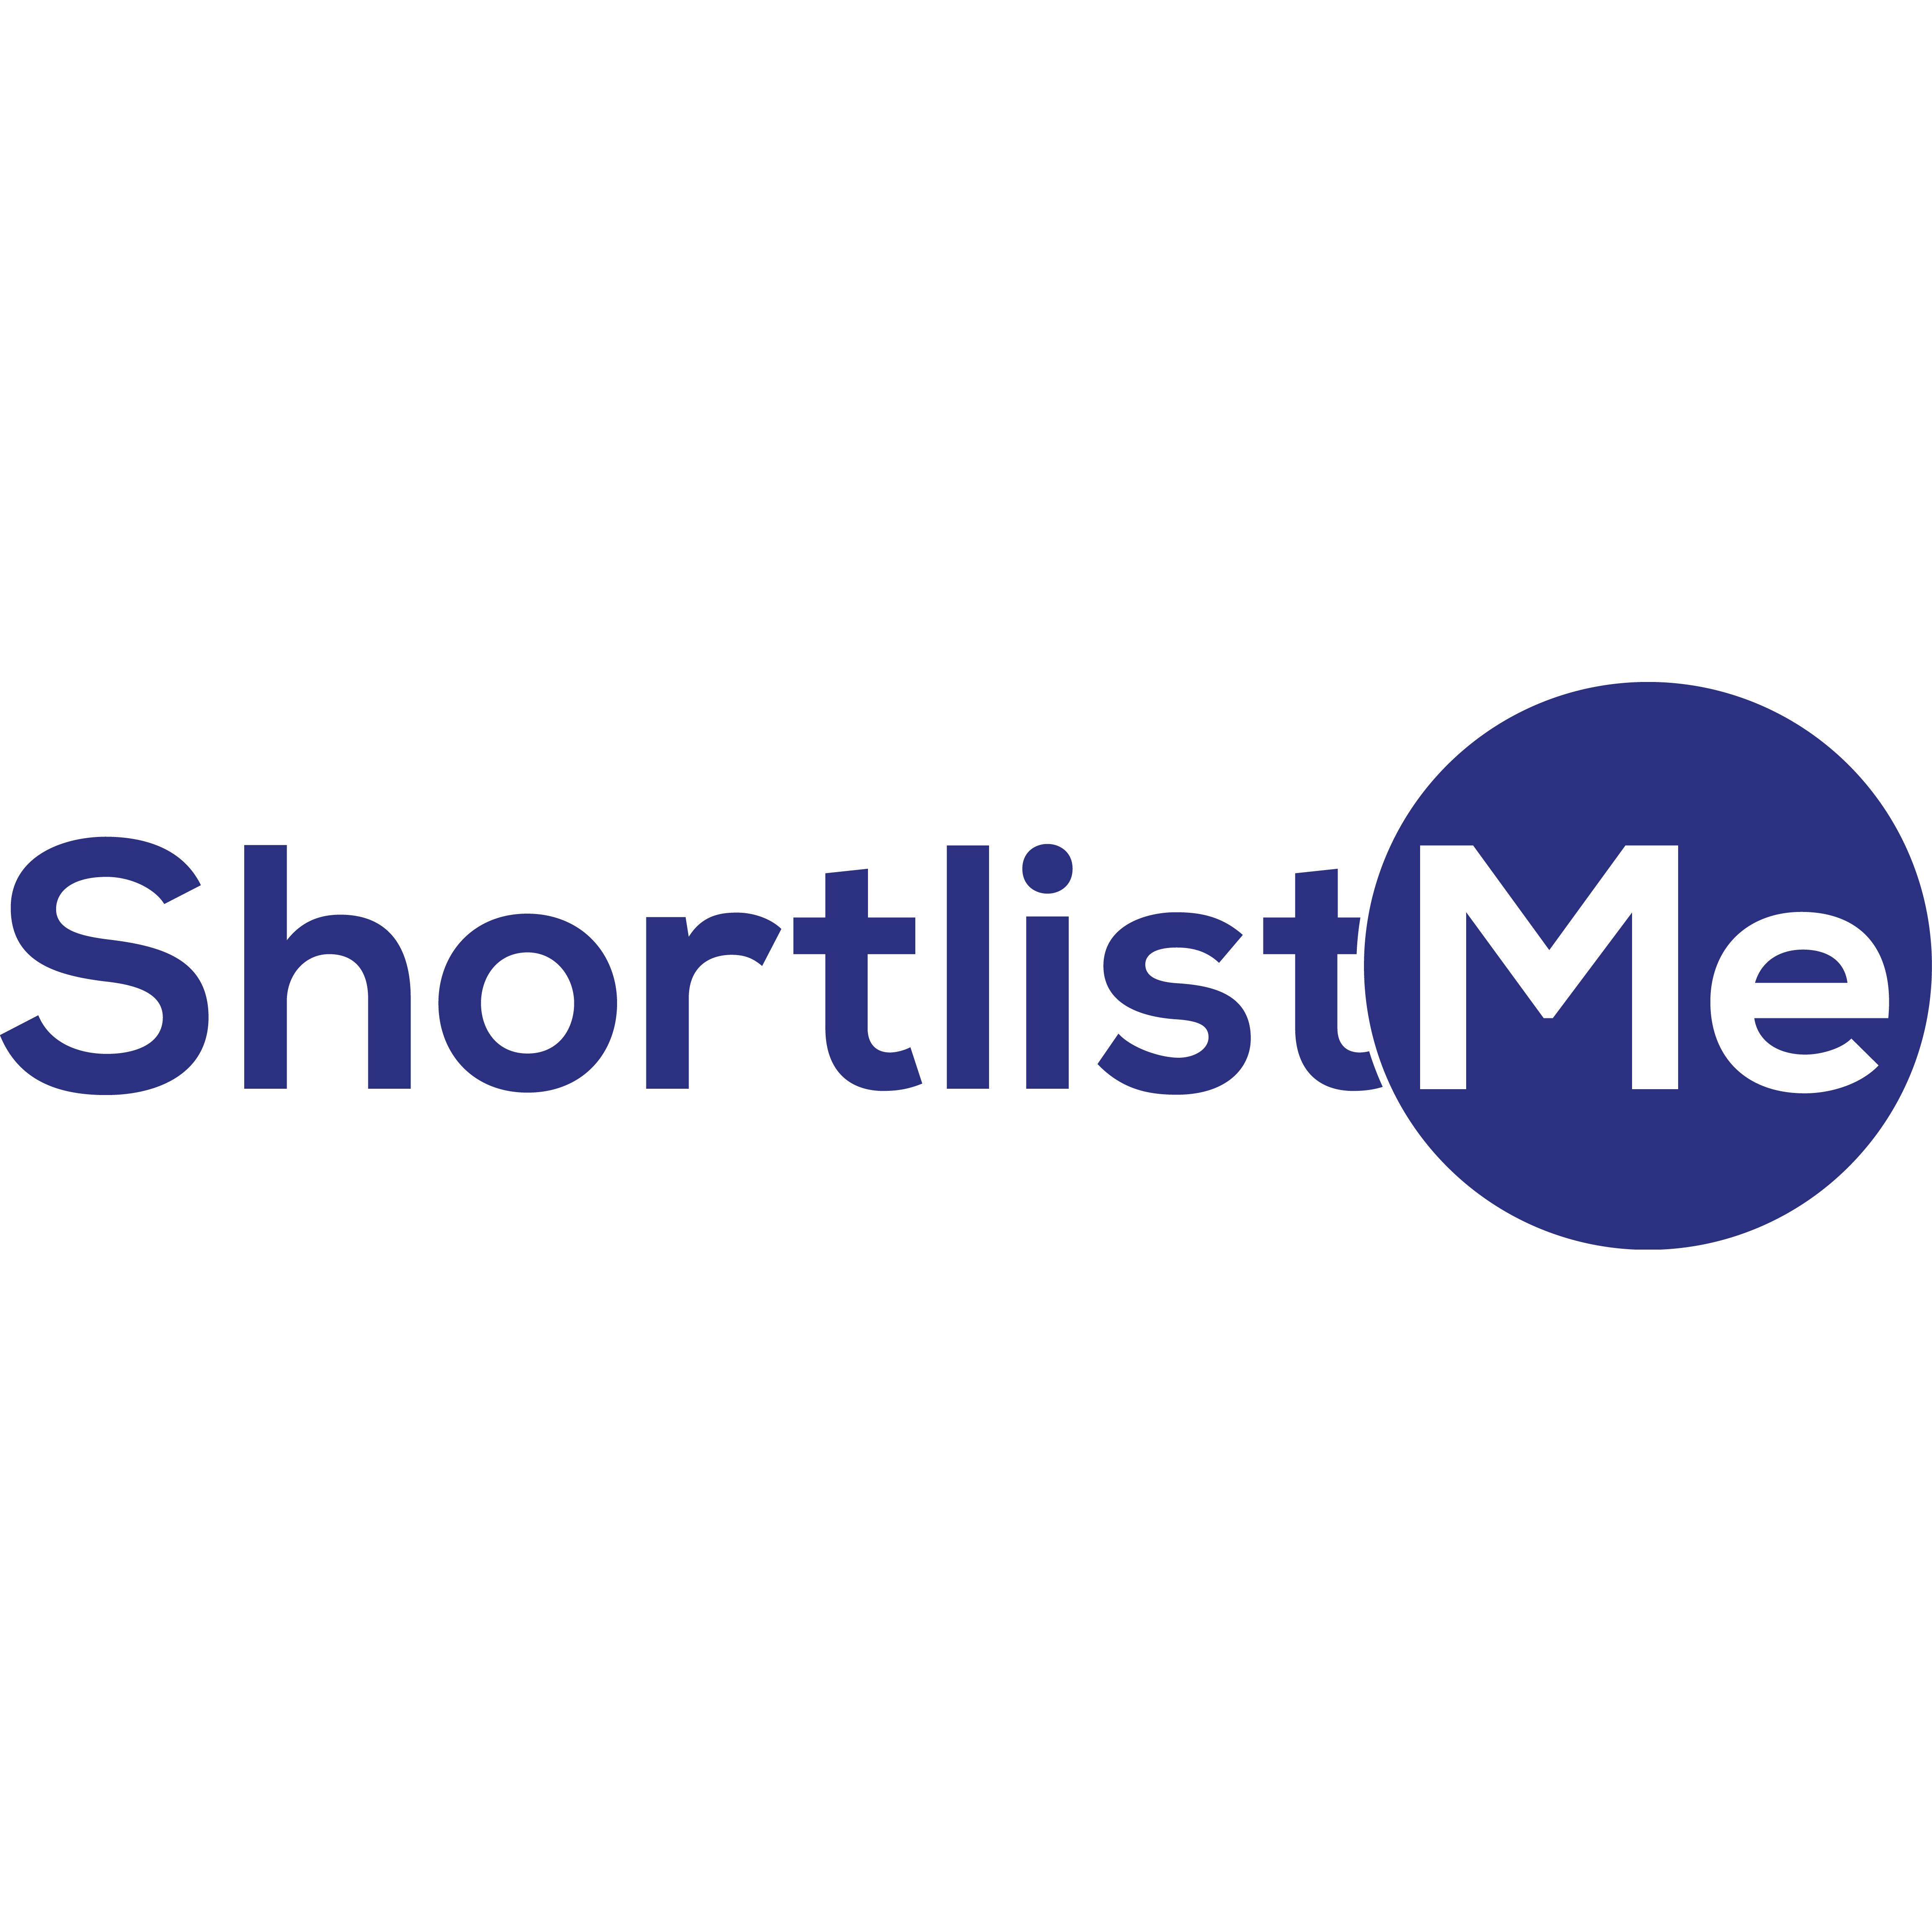 https://www.mncjobsindia.com/company/shortlistme